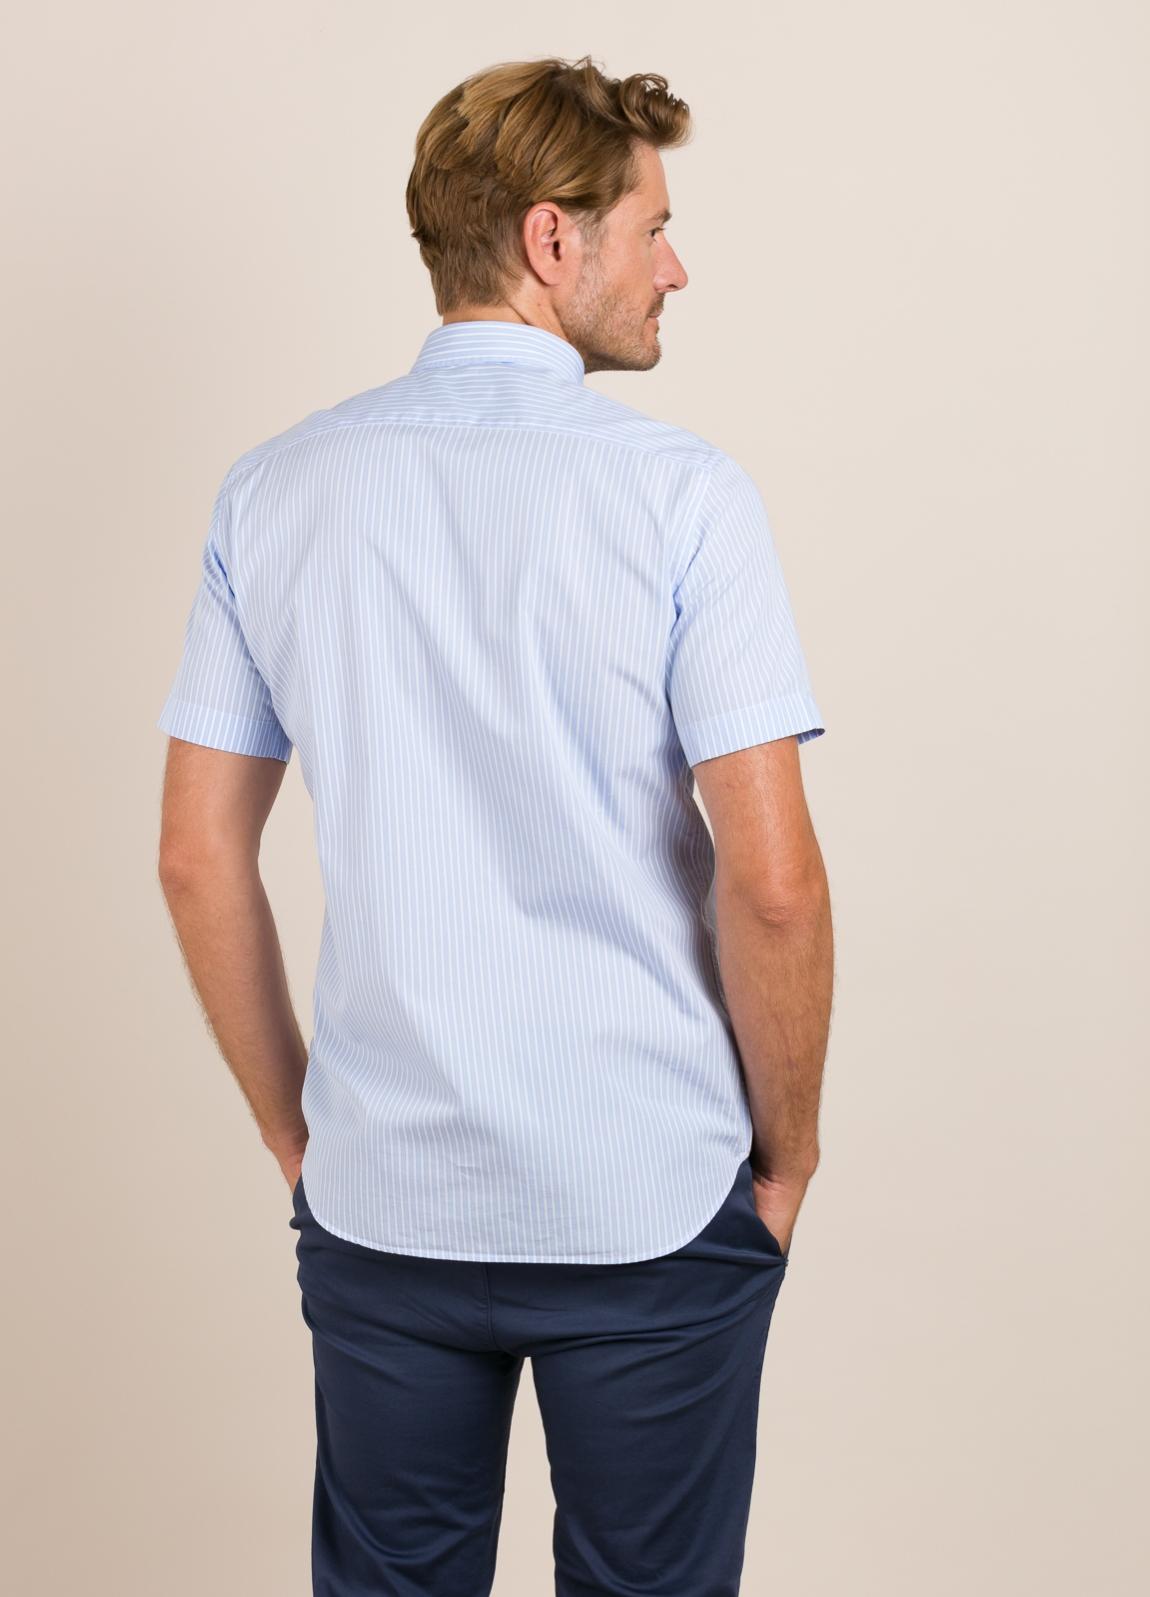 Camisa M/Corta sport FUREST COLECCIÓN Regular FIT rayas celeste - Ítem2